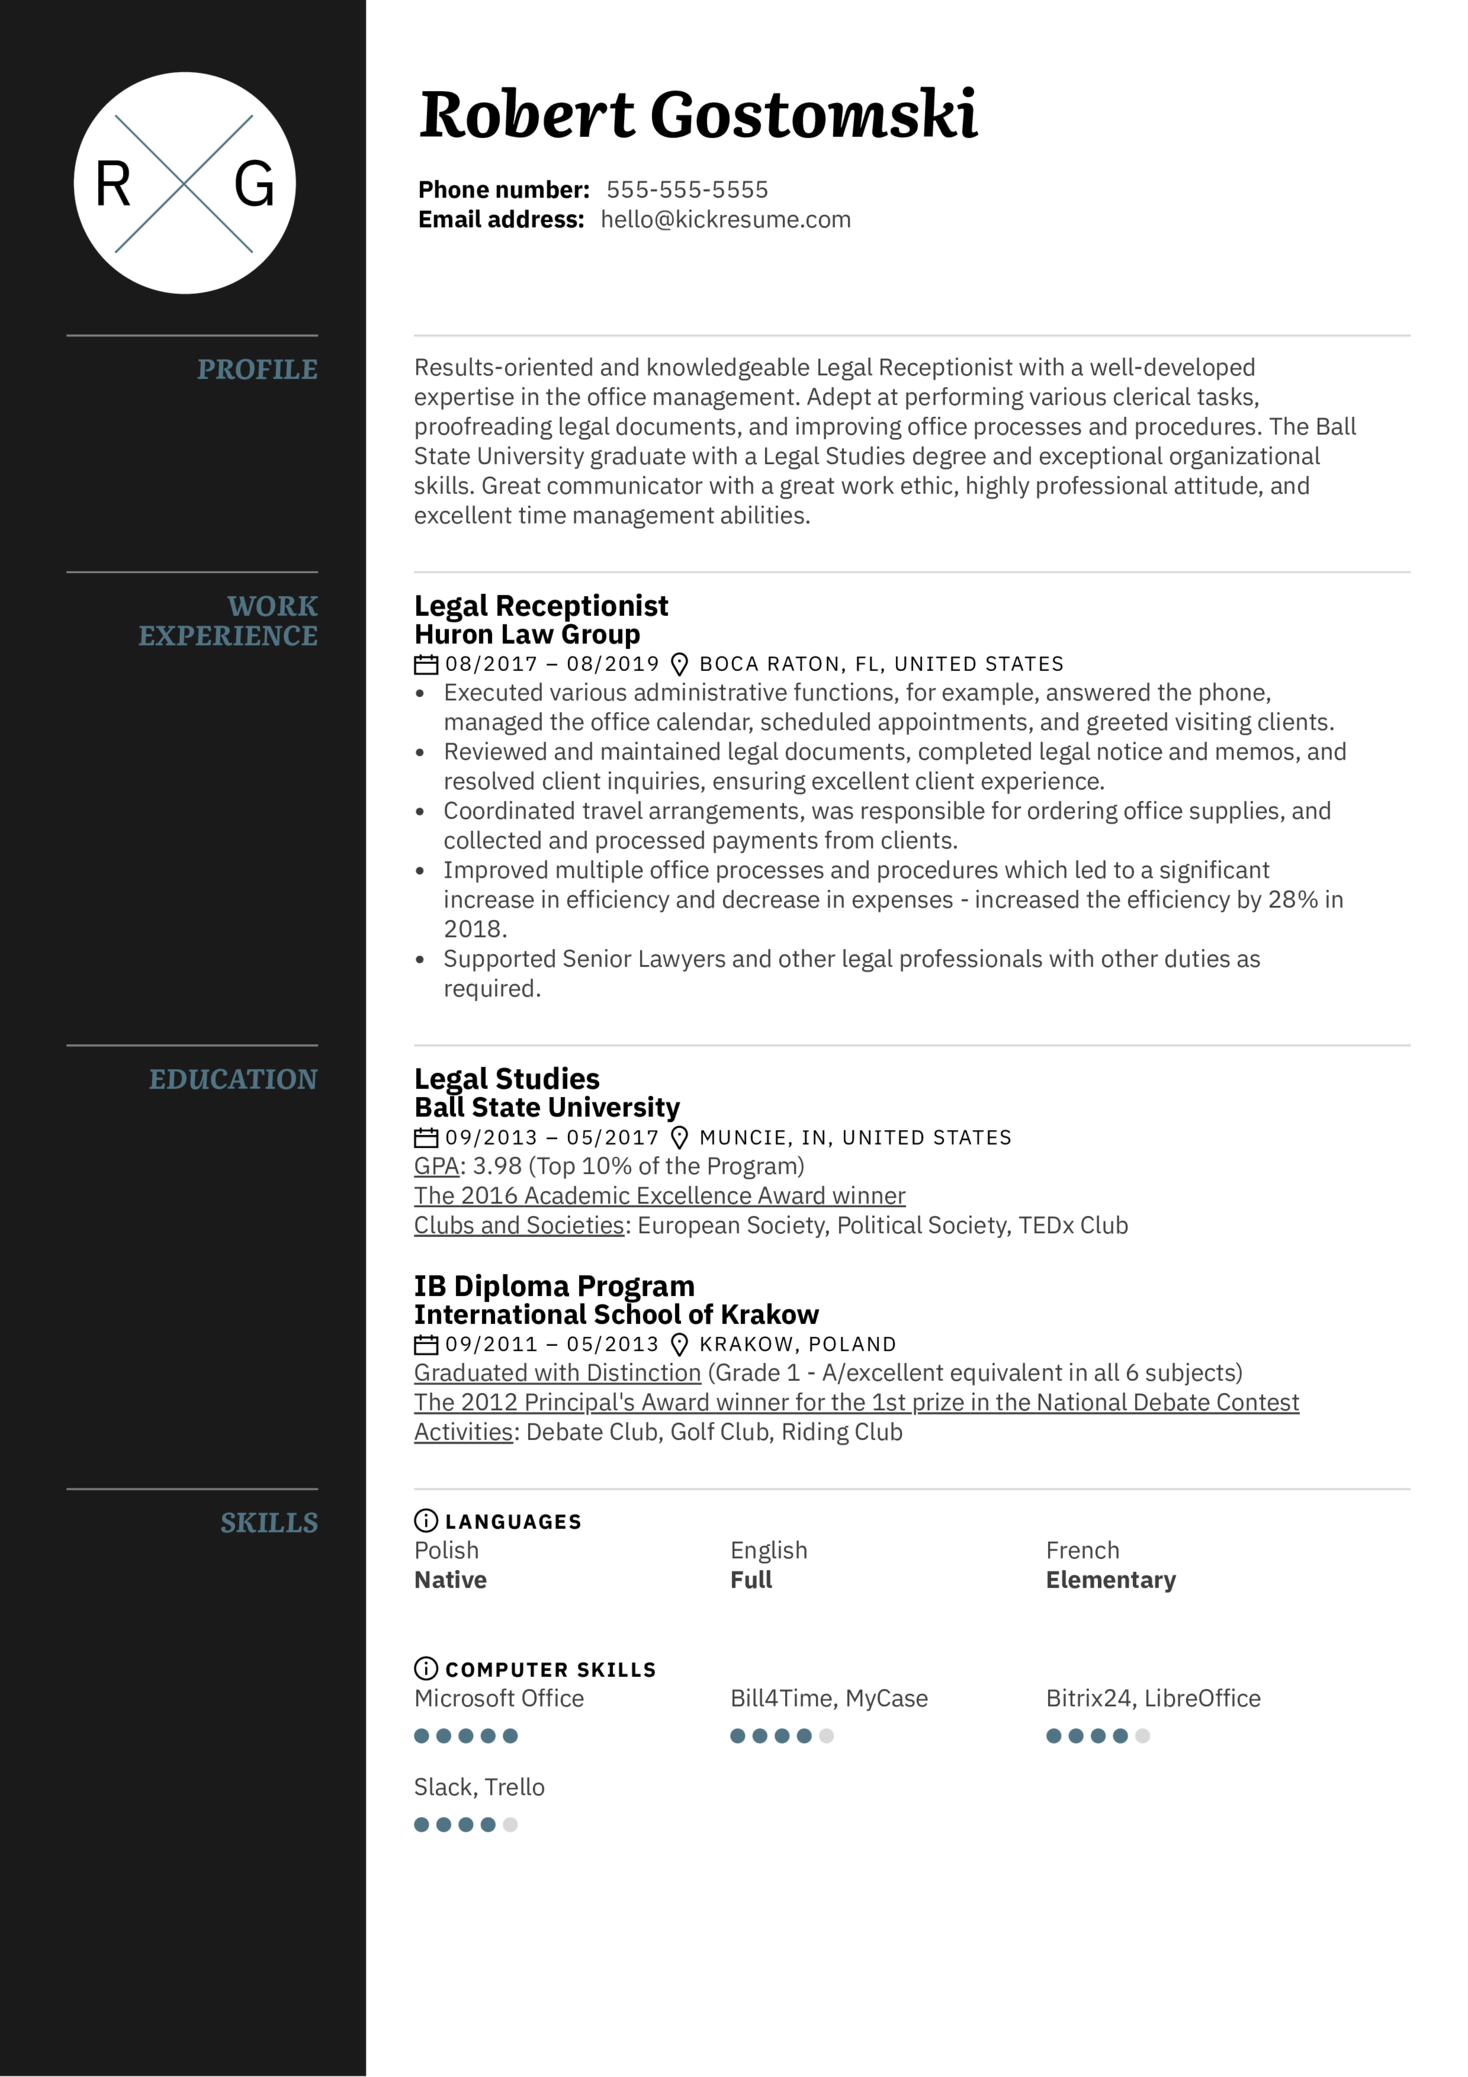 Legal Receptionist Resume Template (parte 1)